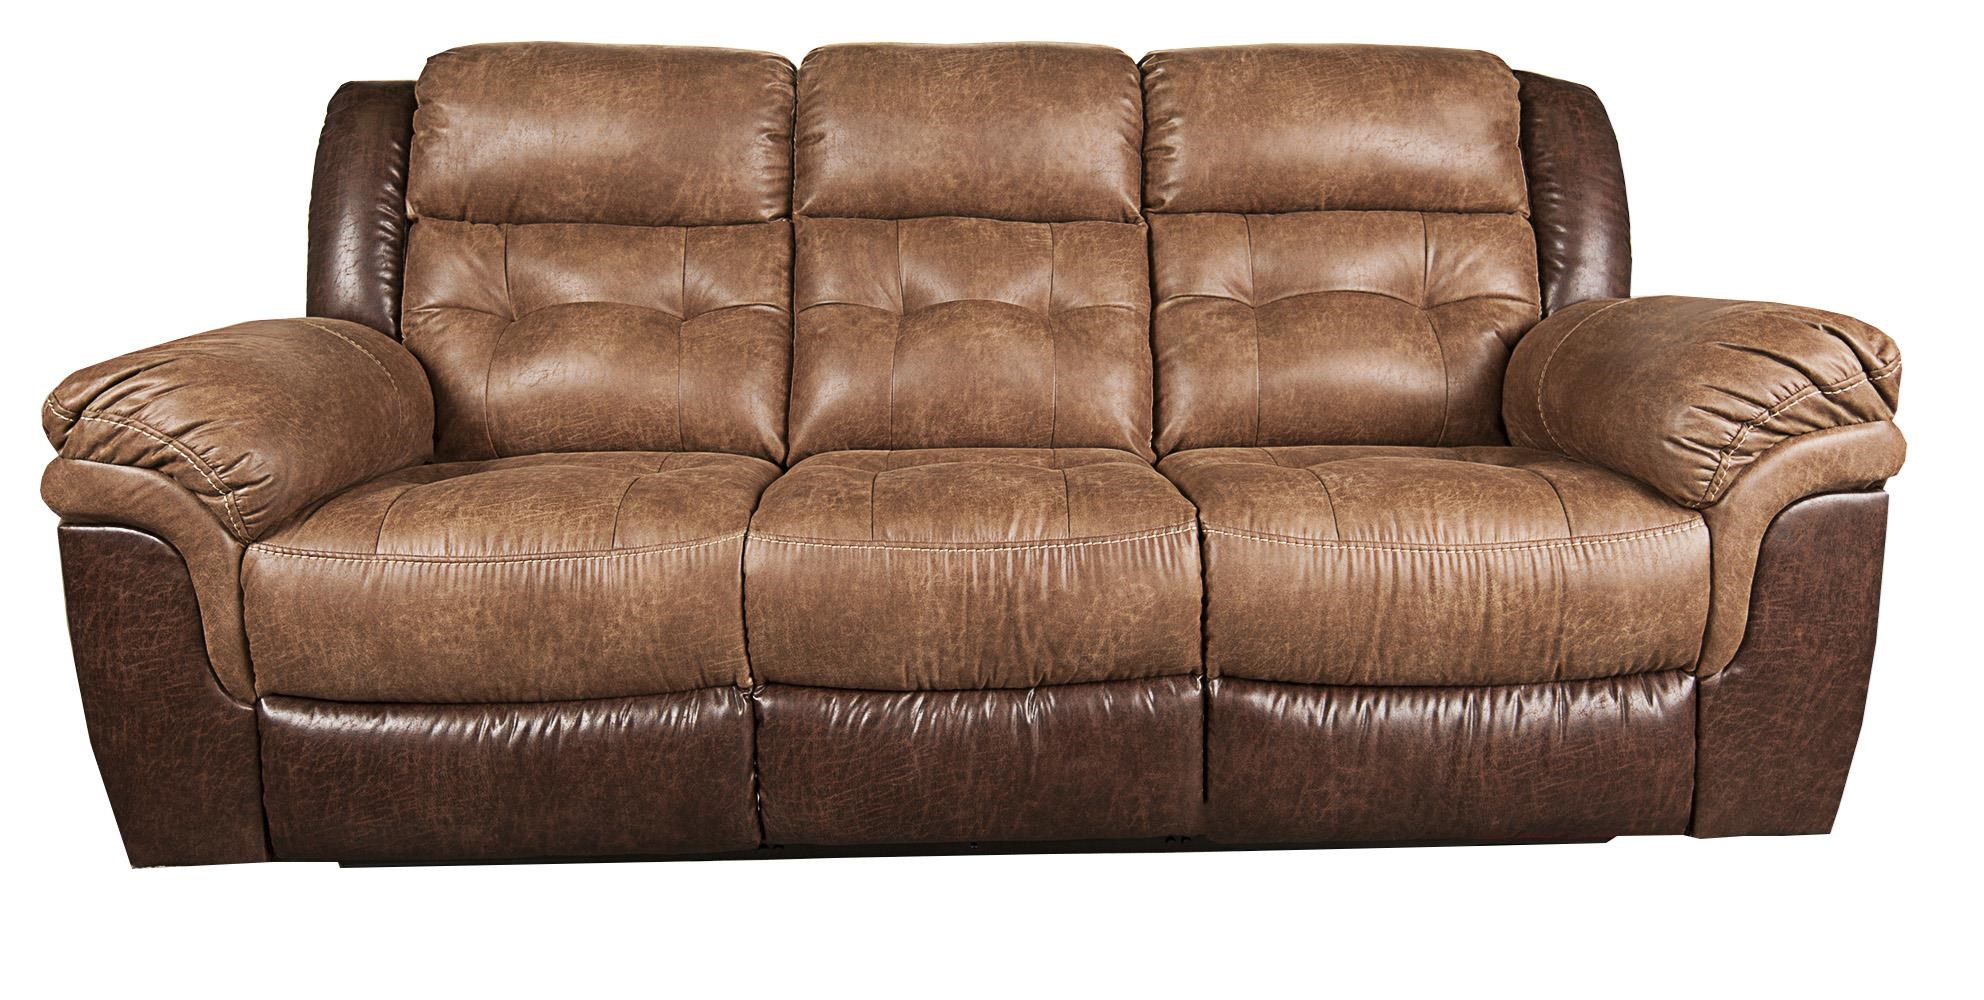 Montrell Reclining Sofa